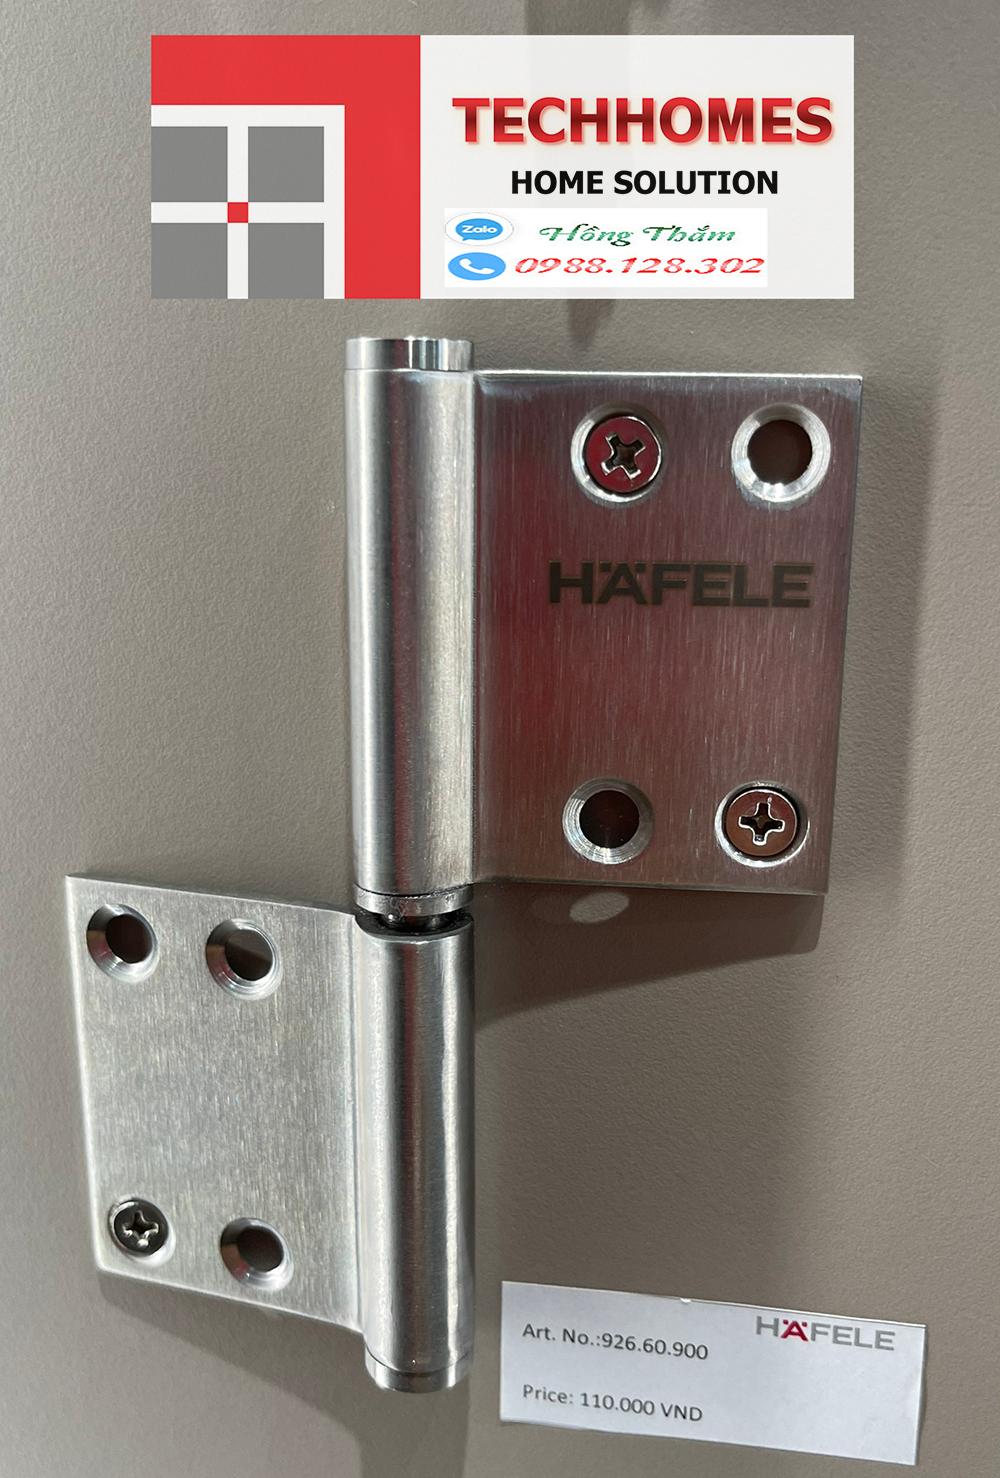 BẢN LỀ NÂNG HẠ HAFELE 926.60.900